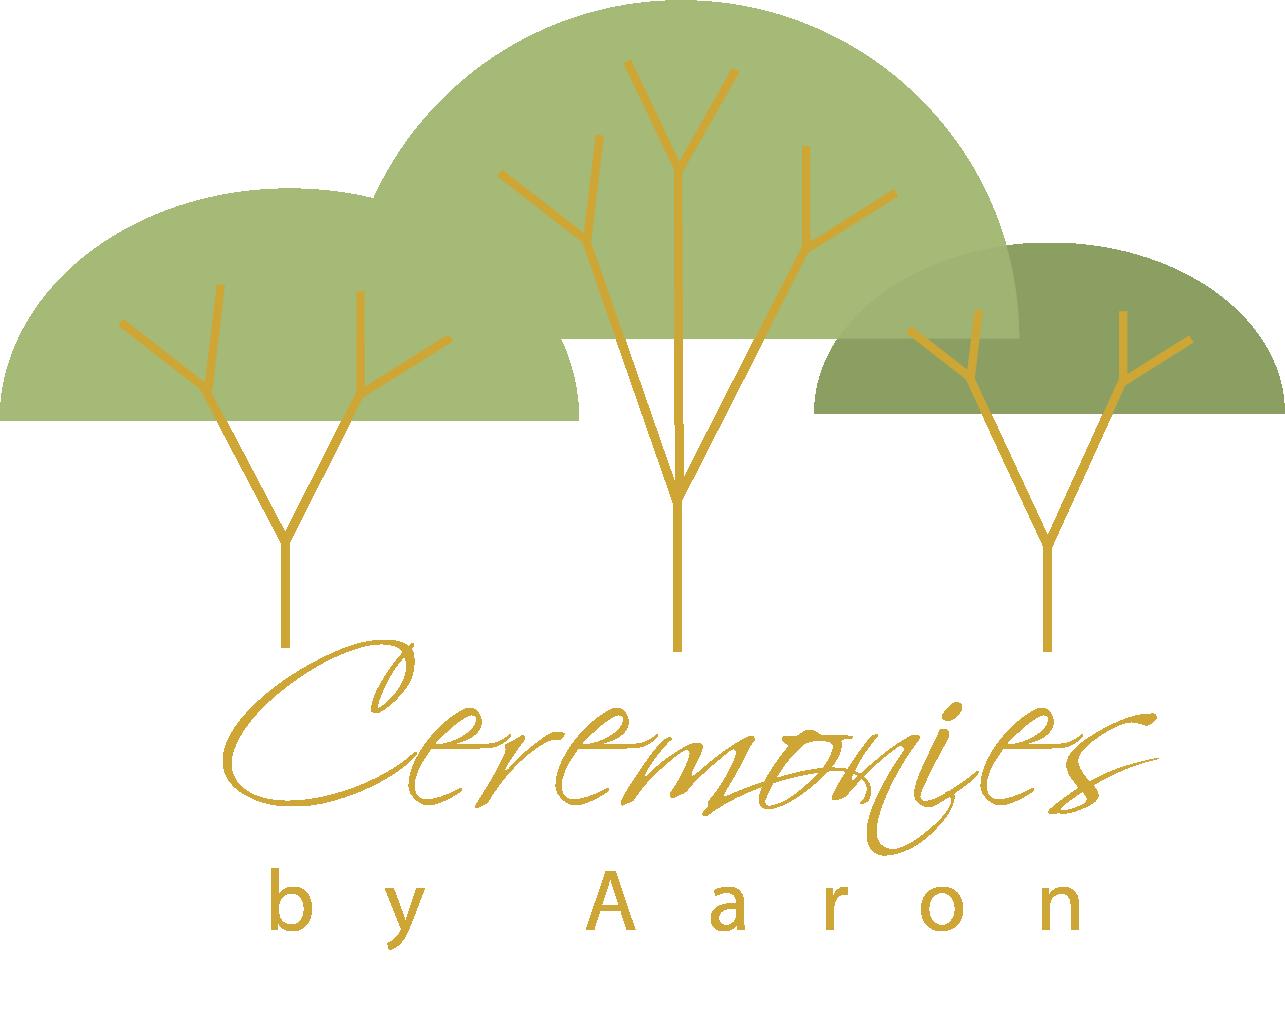 Aaron Logo PNG.png